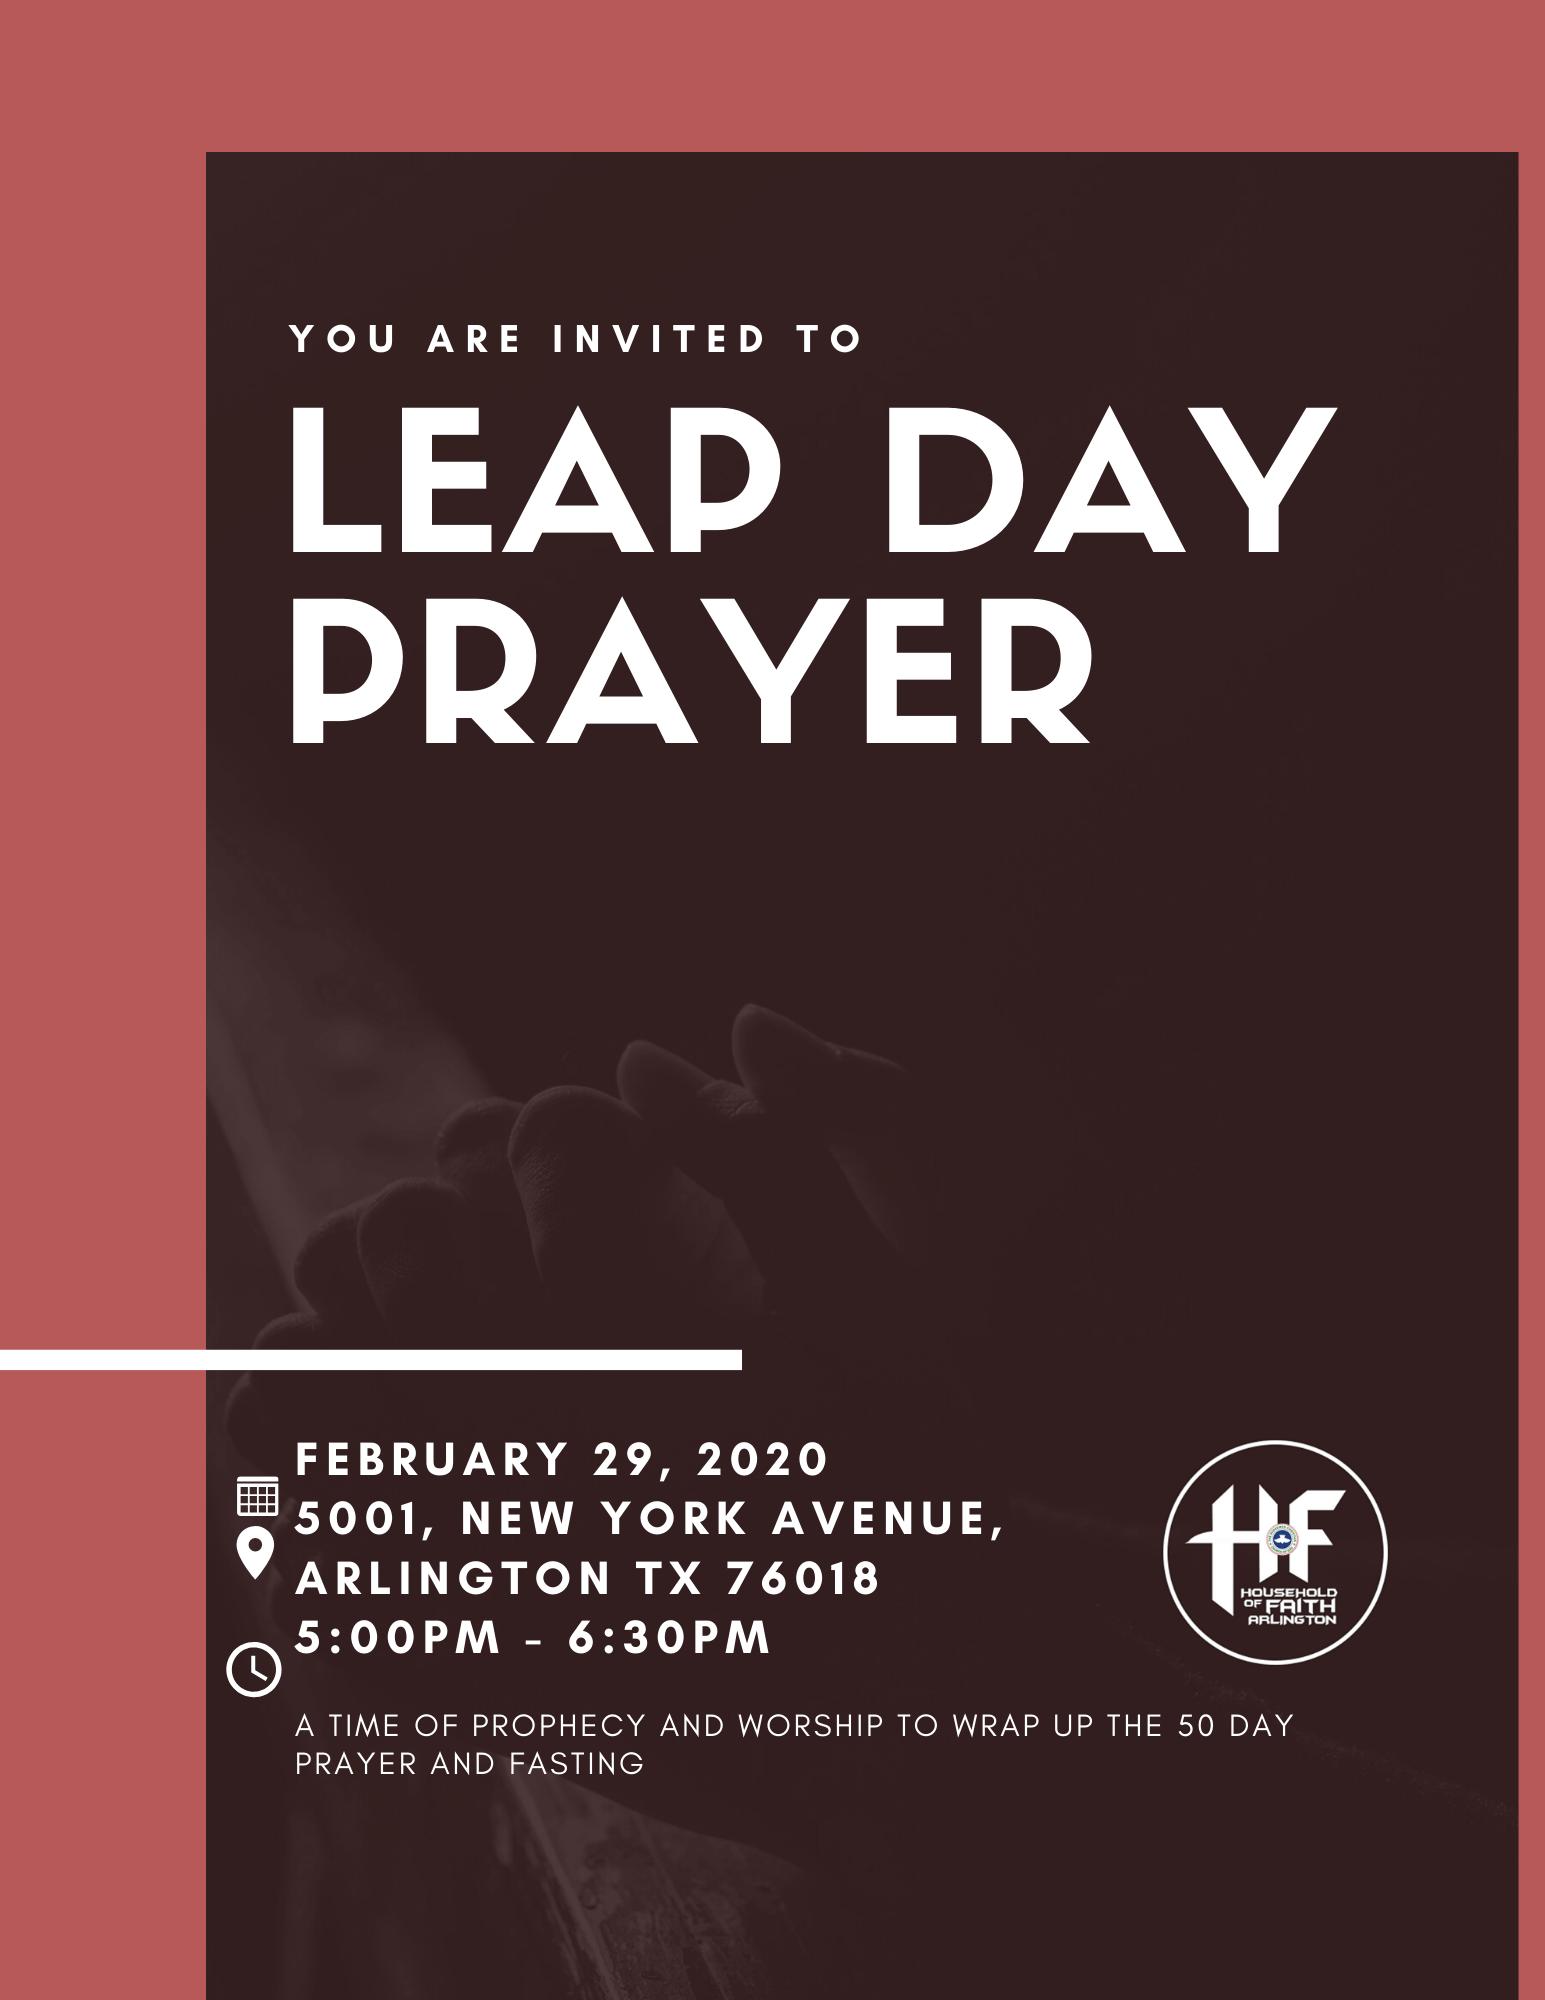 Leap day prayer